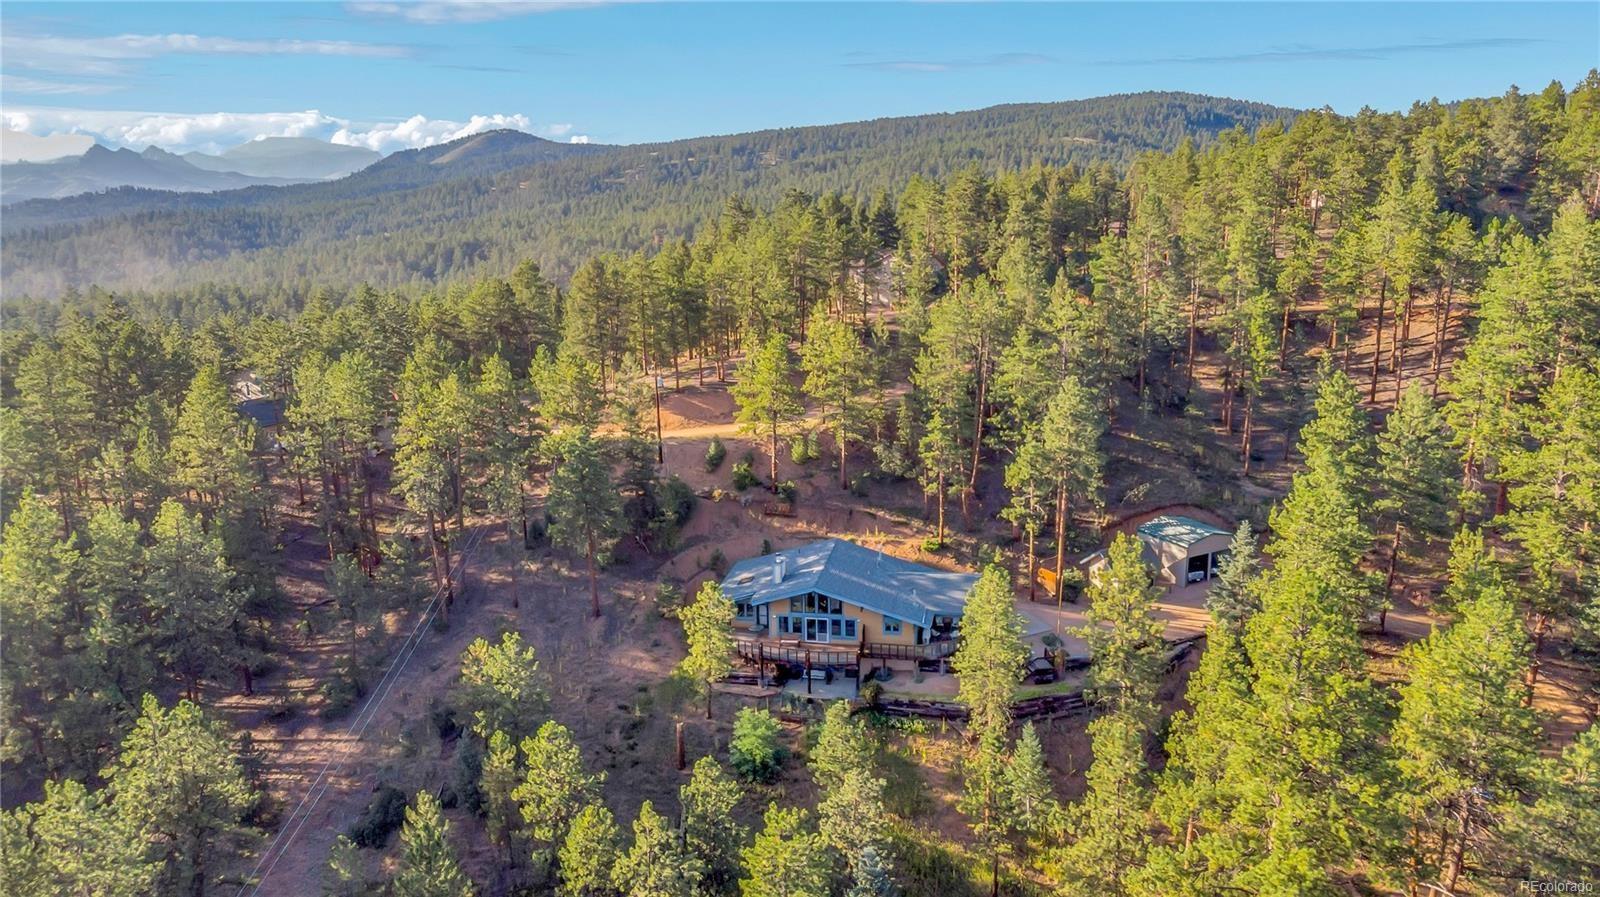 MLS# 4032743 - 2 - 1208 Alpine Drive, Sedalia, CO 80135